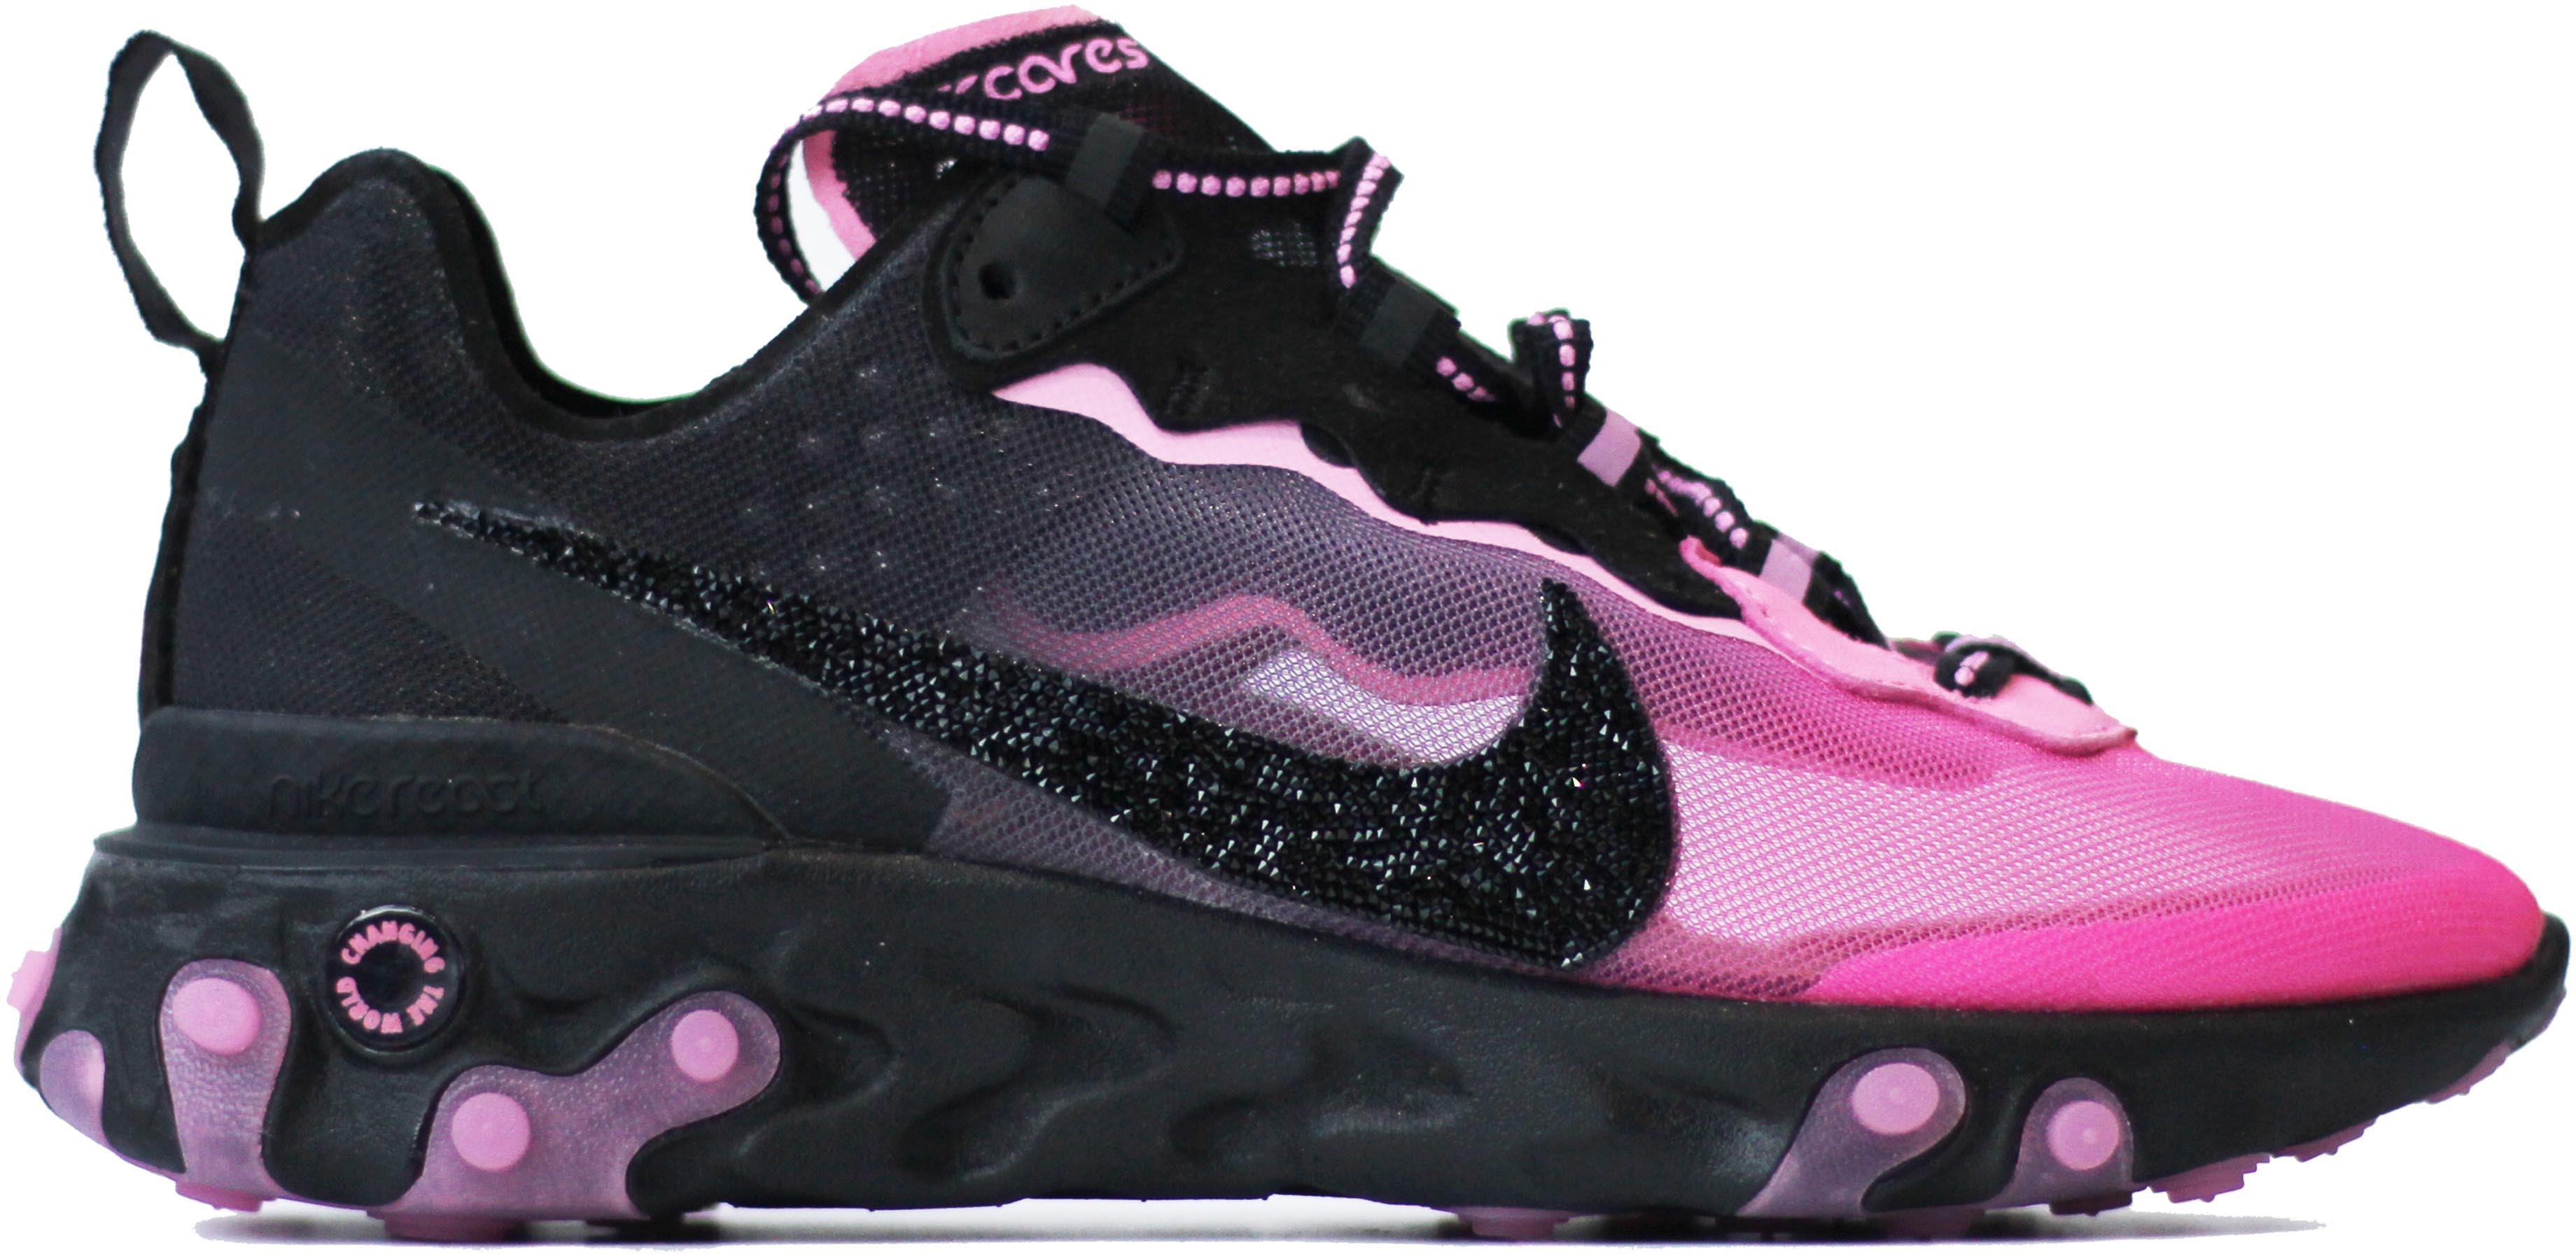 Nike React Element 87 Sneakerroom